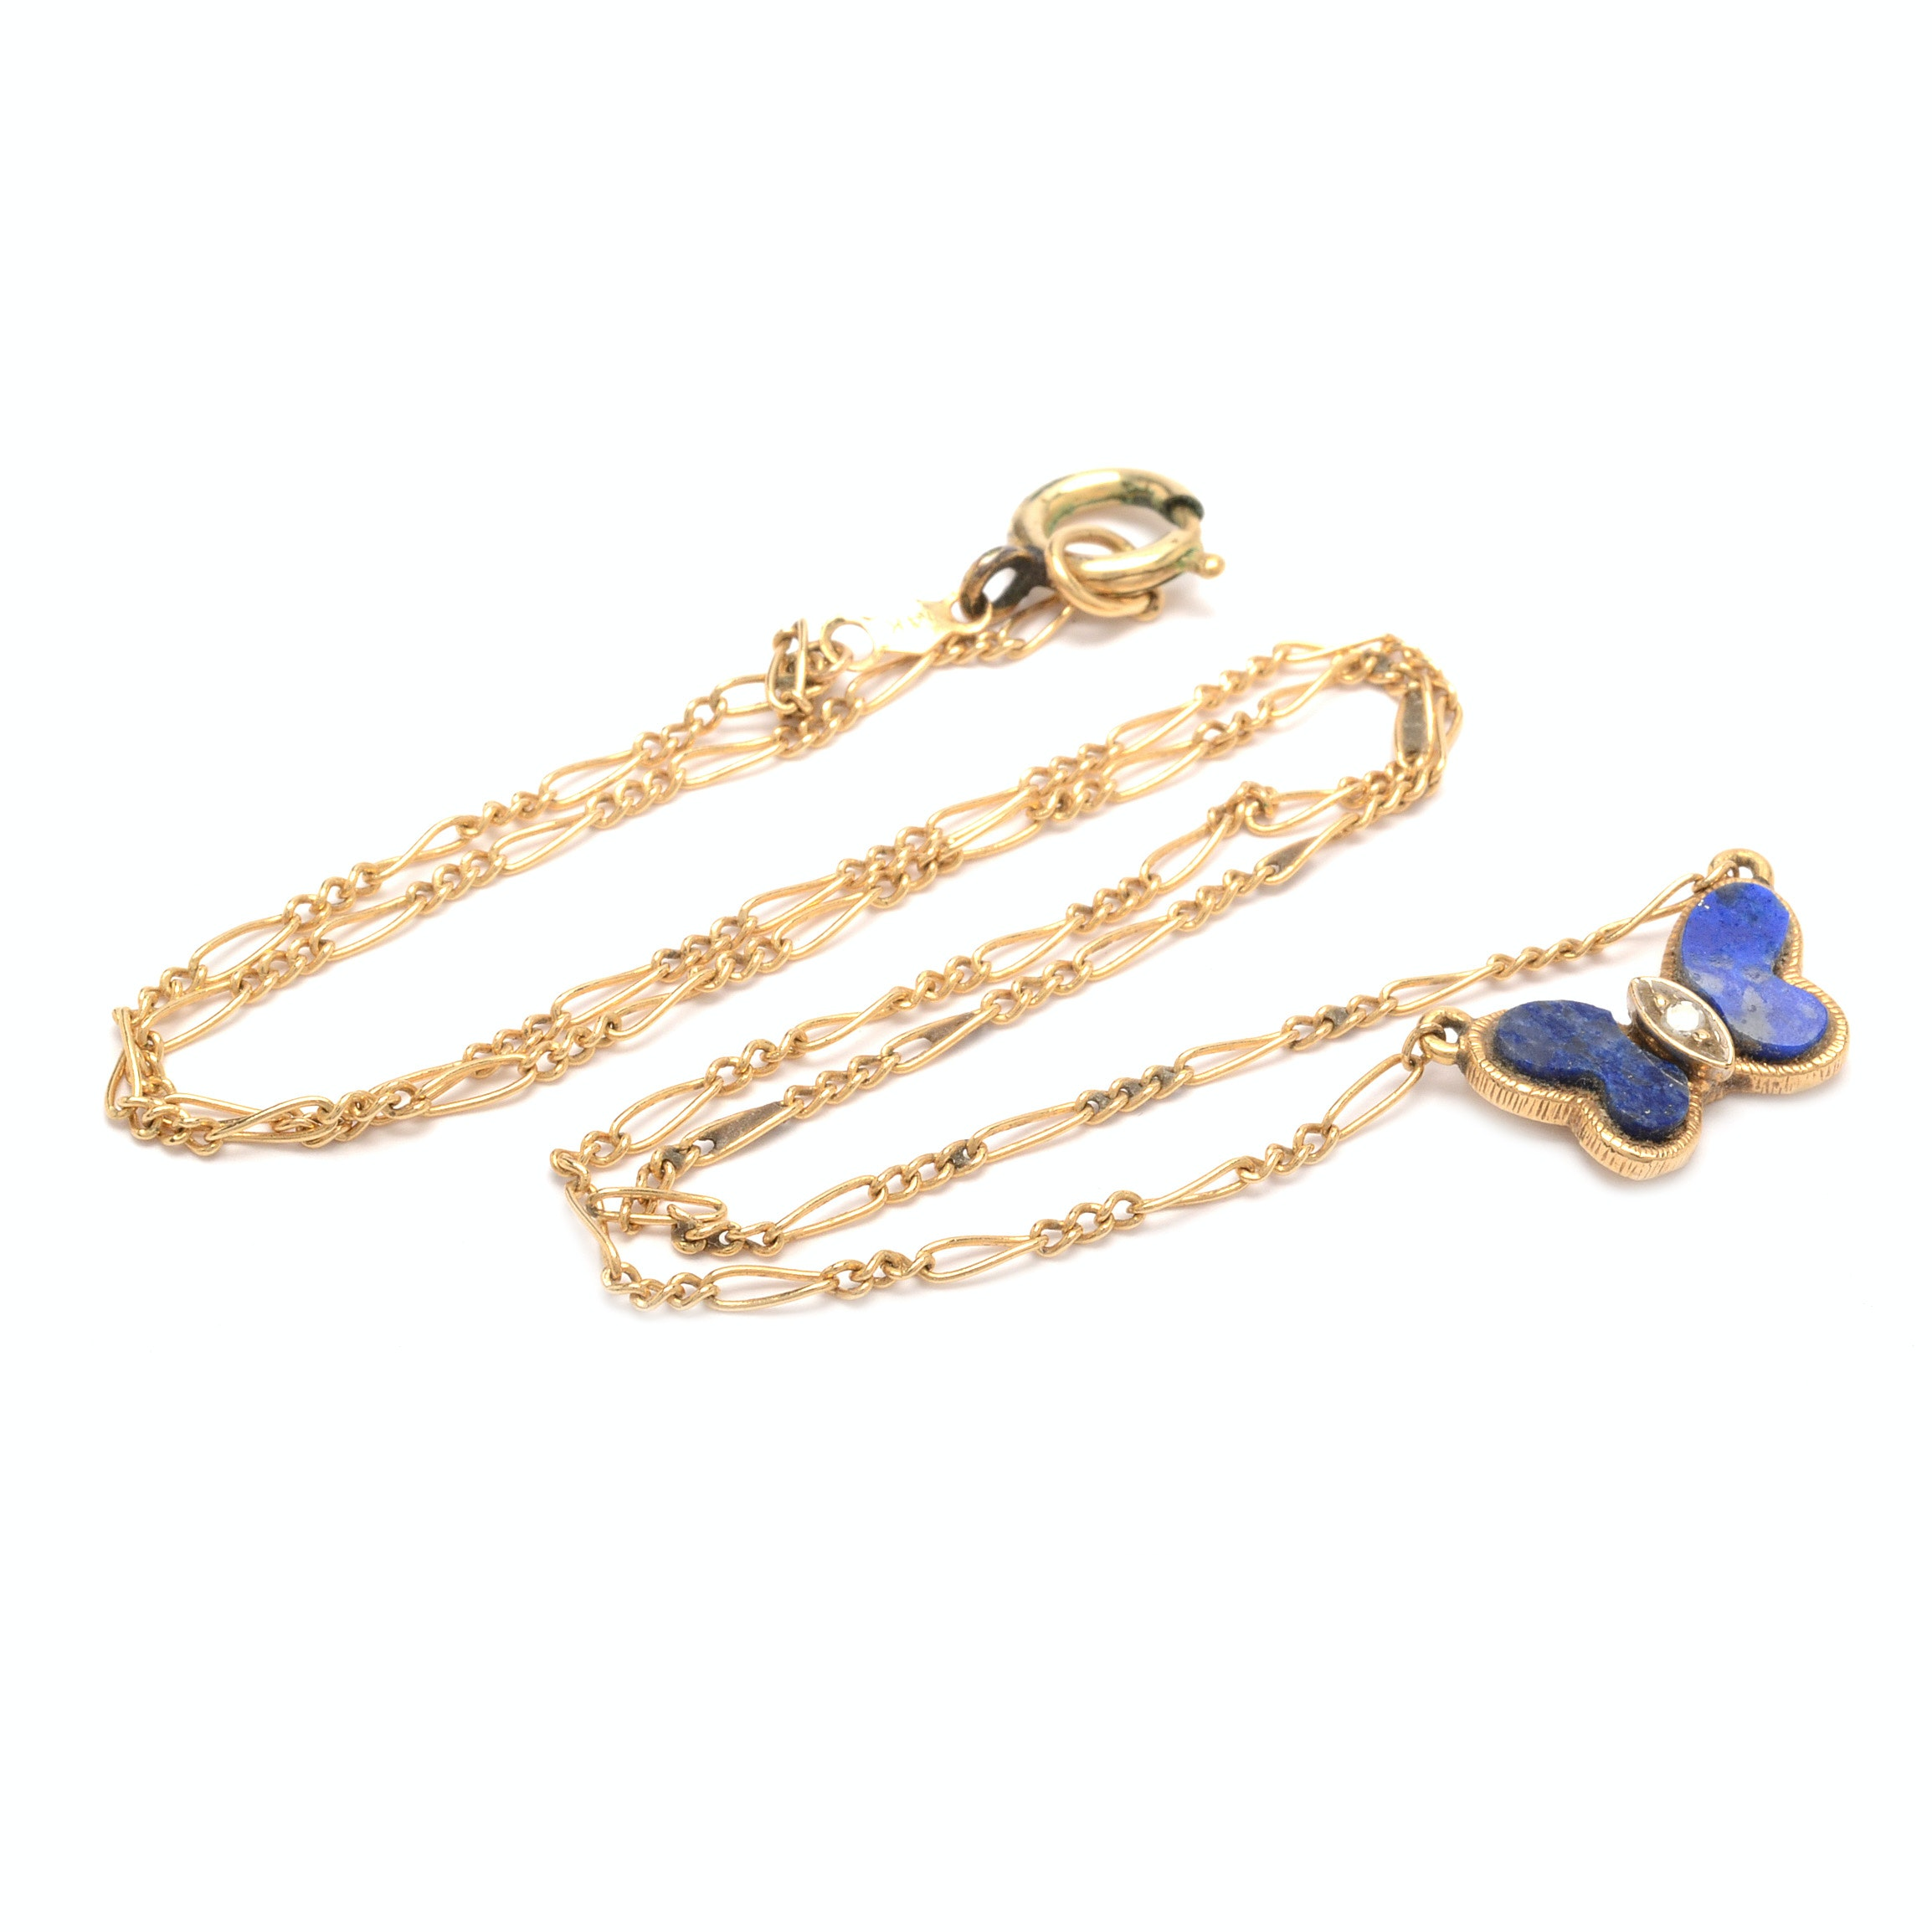 14K Yellow Gold Lapis Lazuli Diamond Butterfly Pendant Necklace